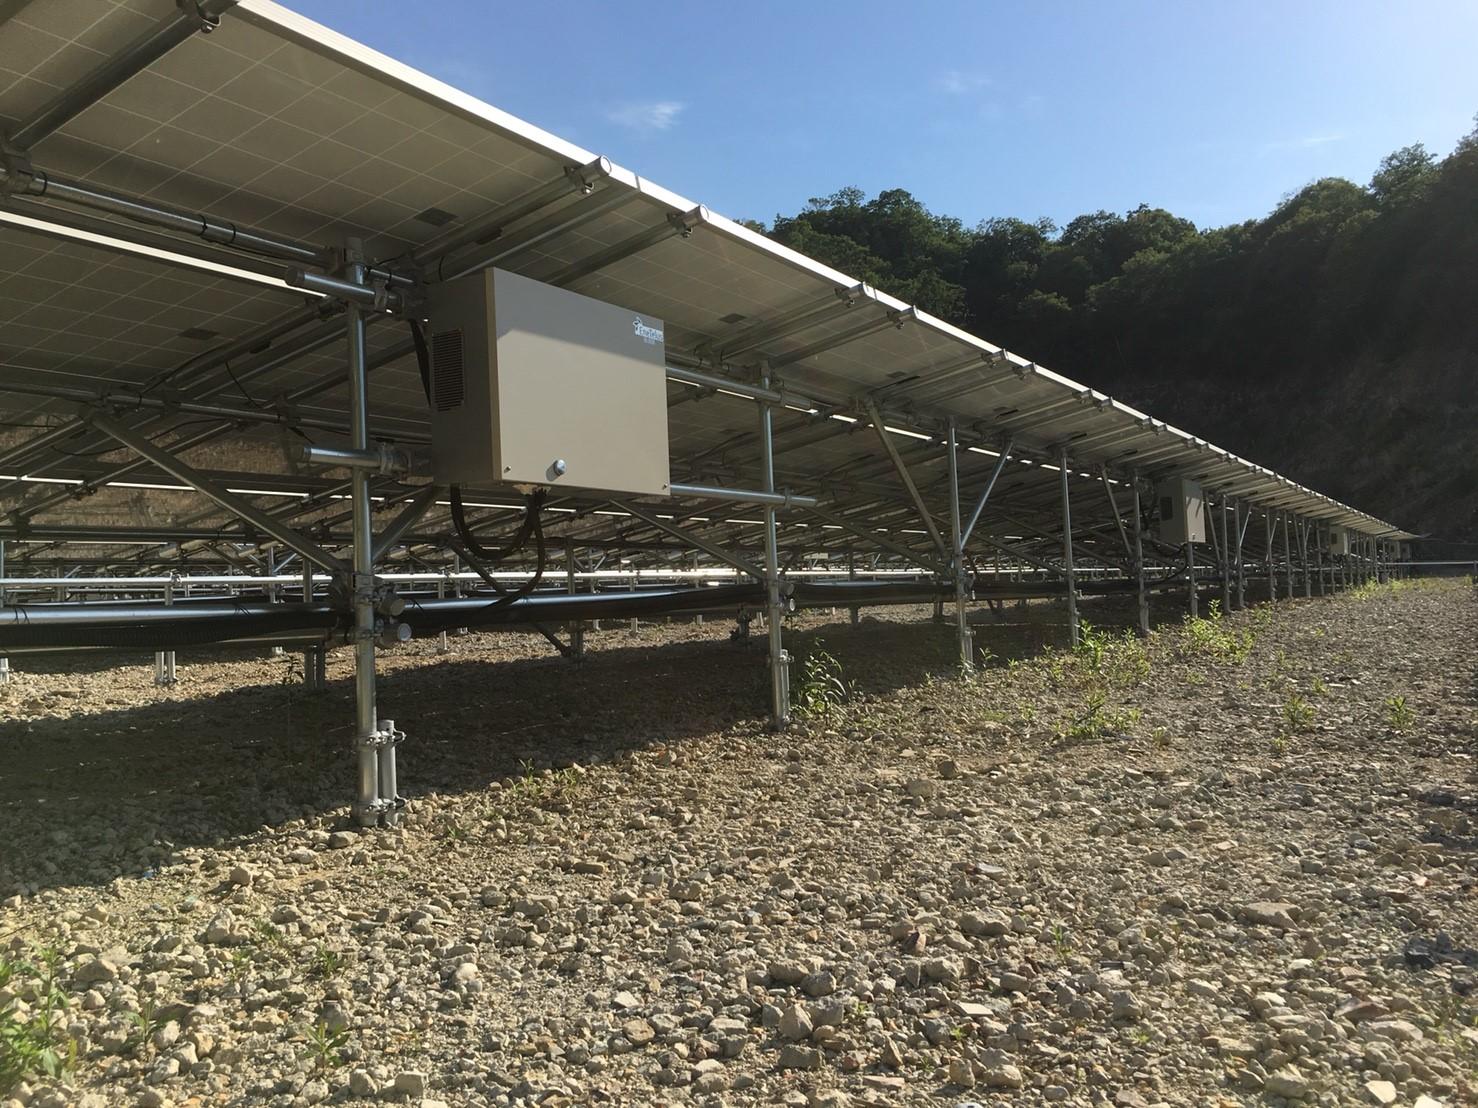 K社様 台風災害における復旧工事 (当初施工店の破綻につき)  架台設置から全改修 400kW